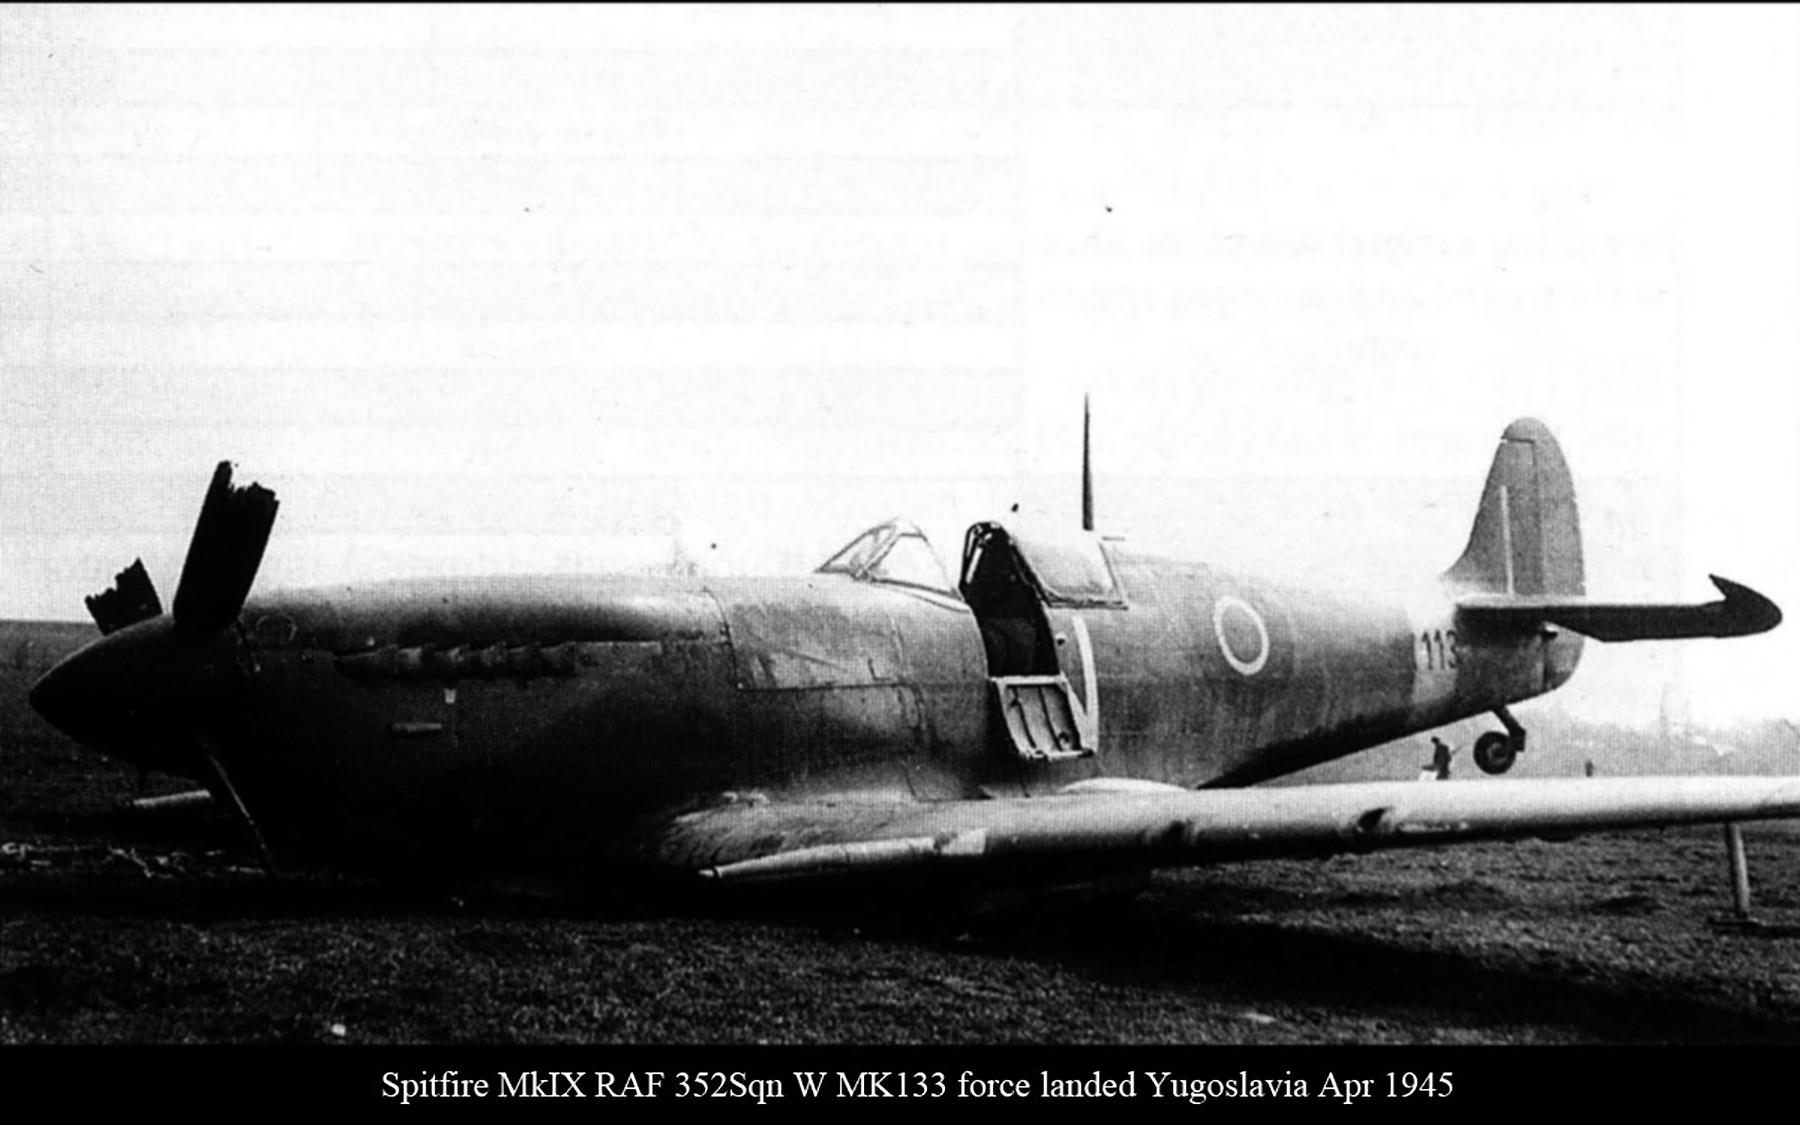 Spitfire MkIX RAF 352Sqn W MK133 forced landed Yugoslavia Apr 1945 01